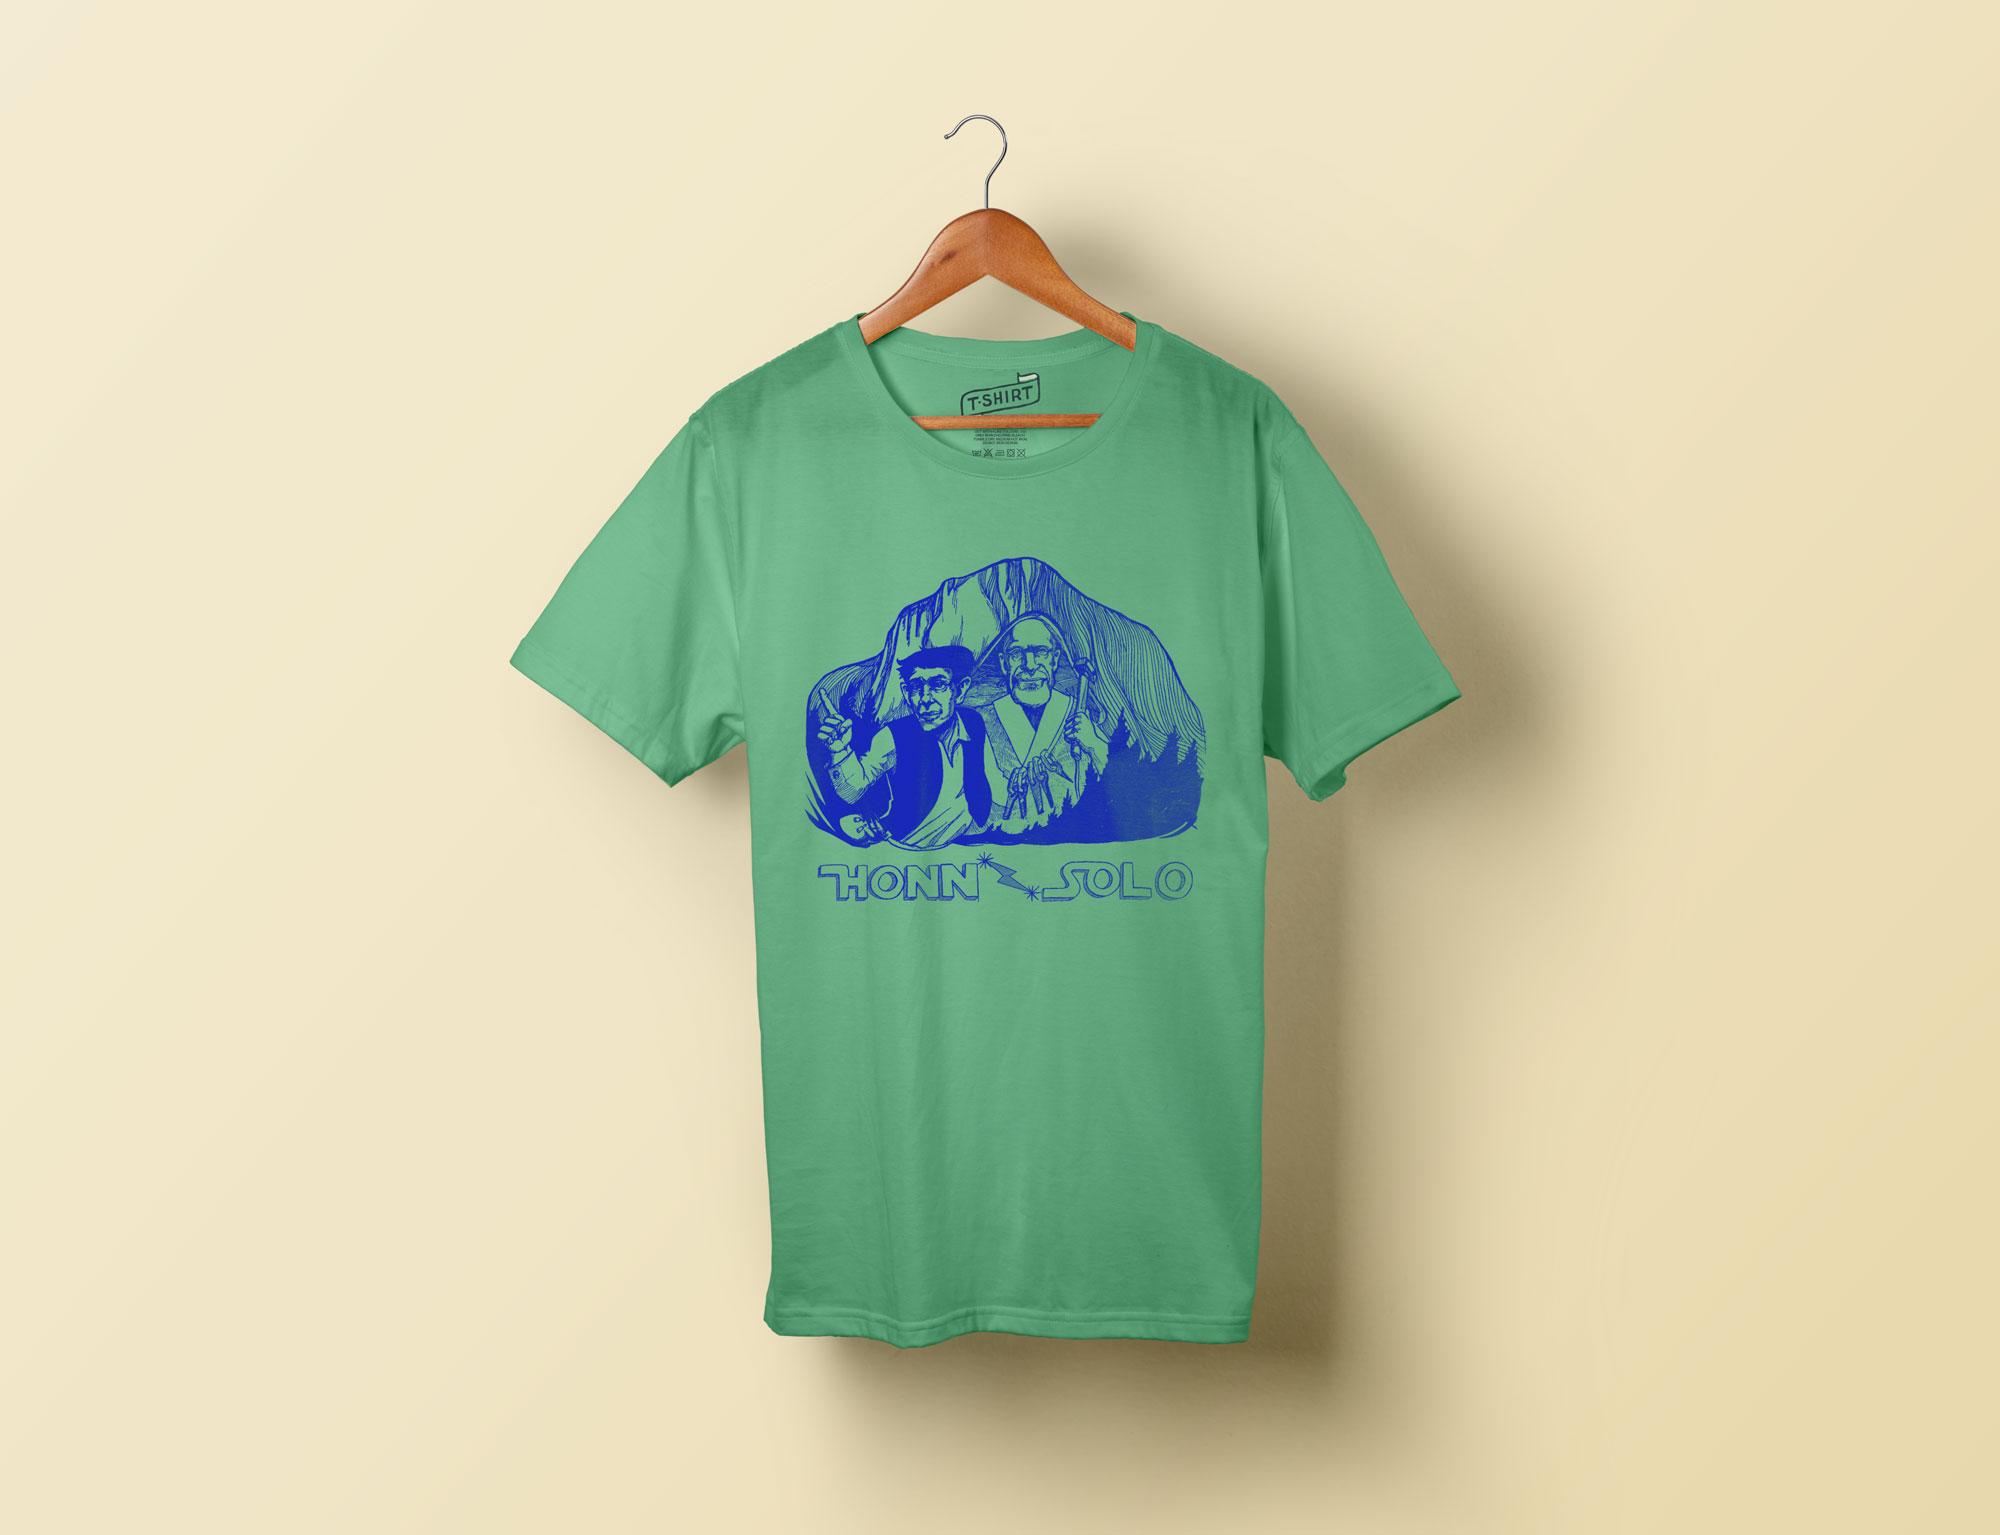 aacT-Shirt-Hanging-Mockup.jpg